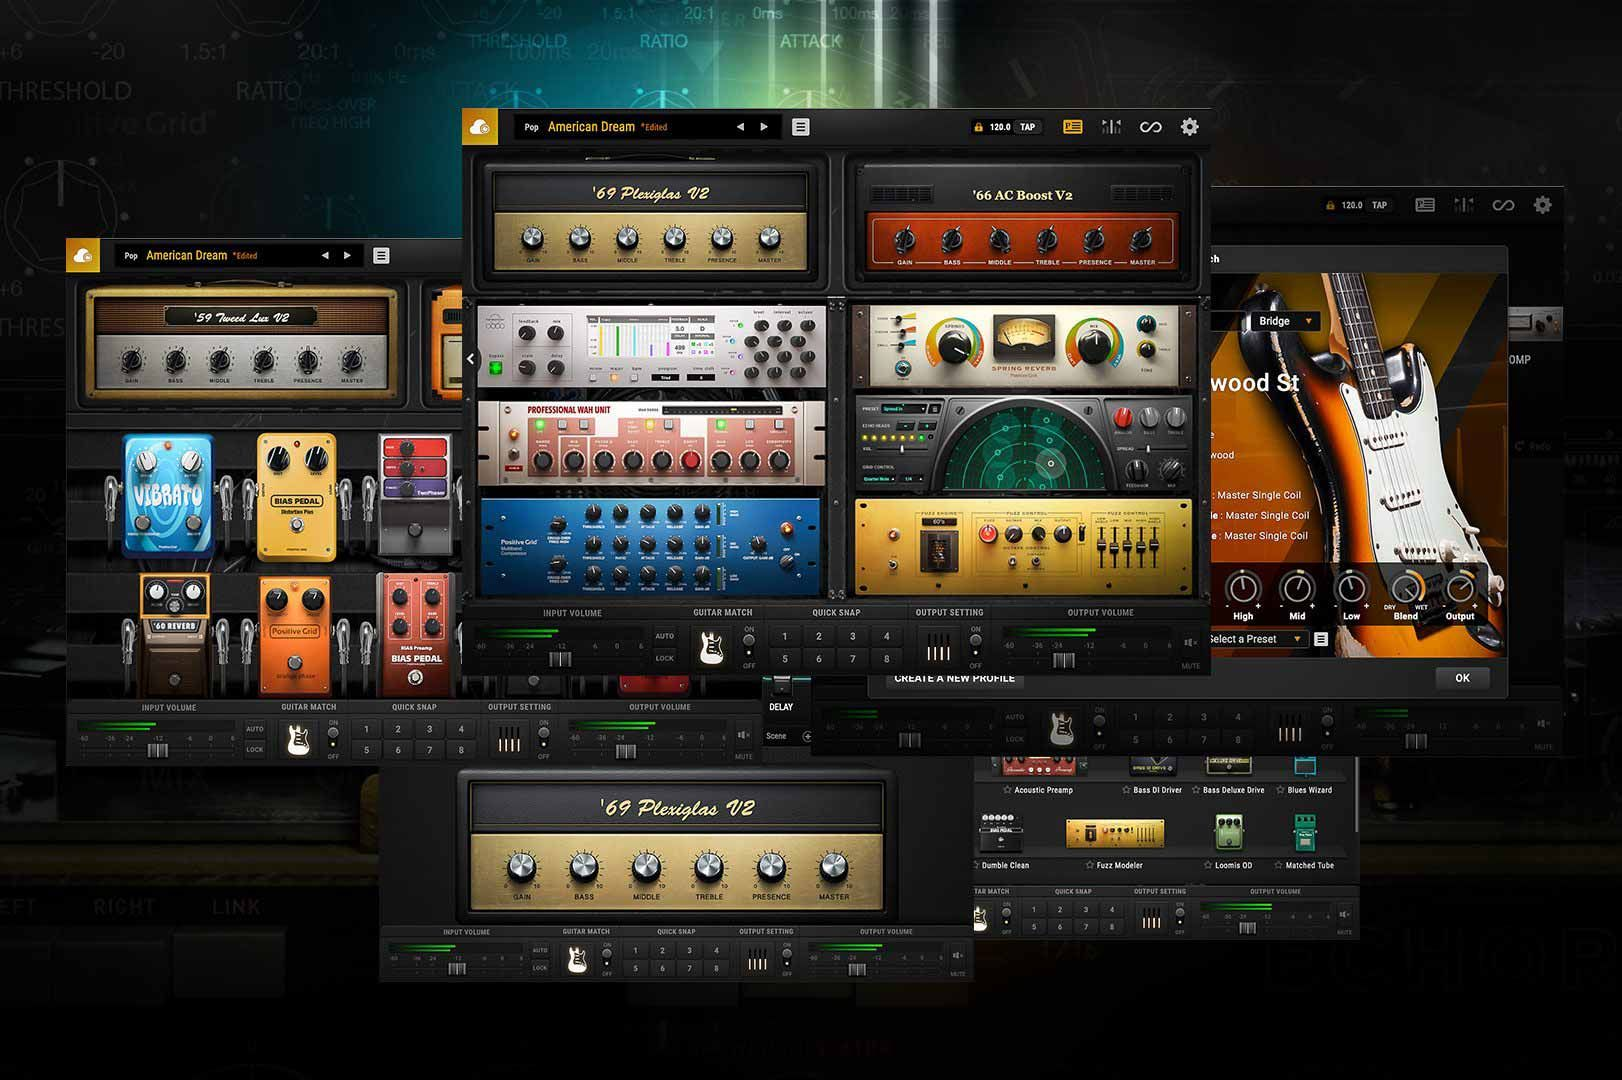 Positive Gridbias Fx 2 Elitev2 1 9 4885100 Amplifiers122 Effects Units210 Factory Presetsguitar Match 2 Guitar Effects Effects Processor Multitrack Recording